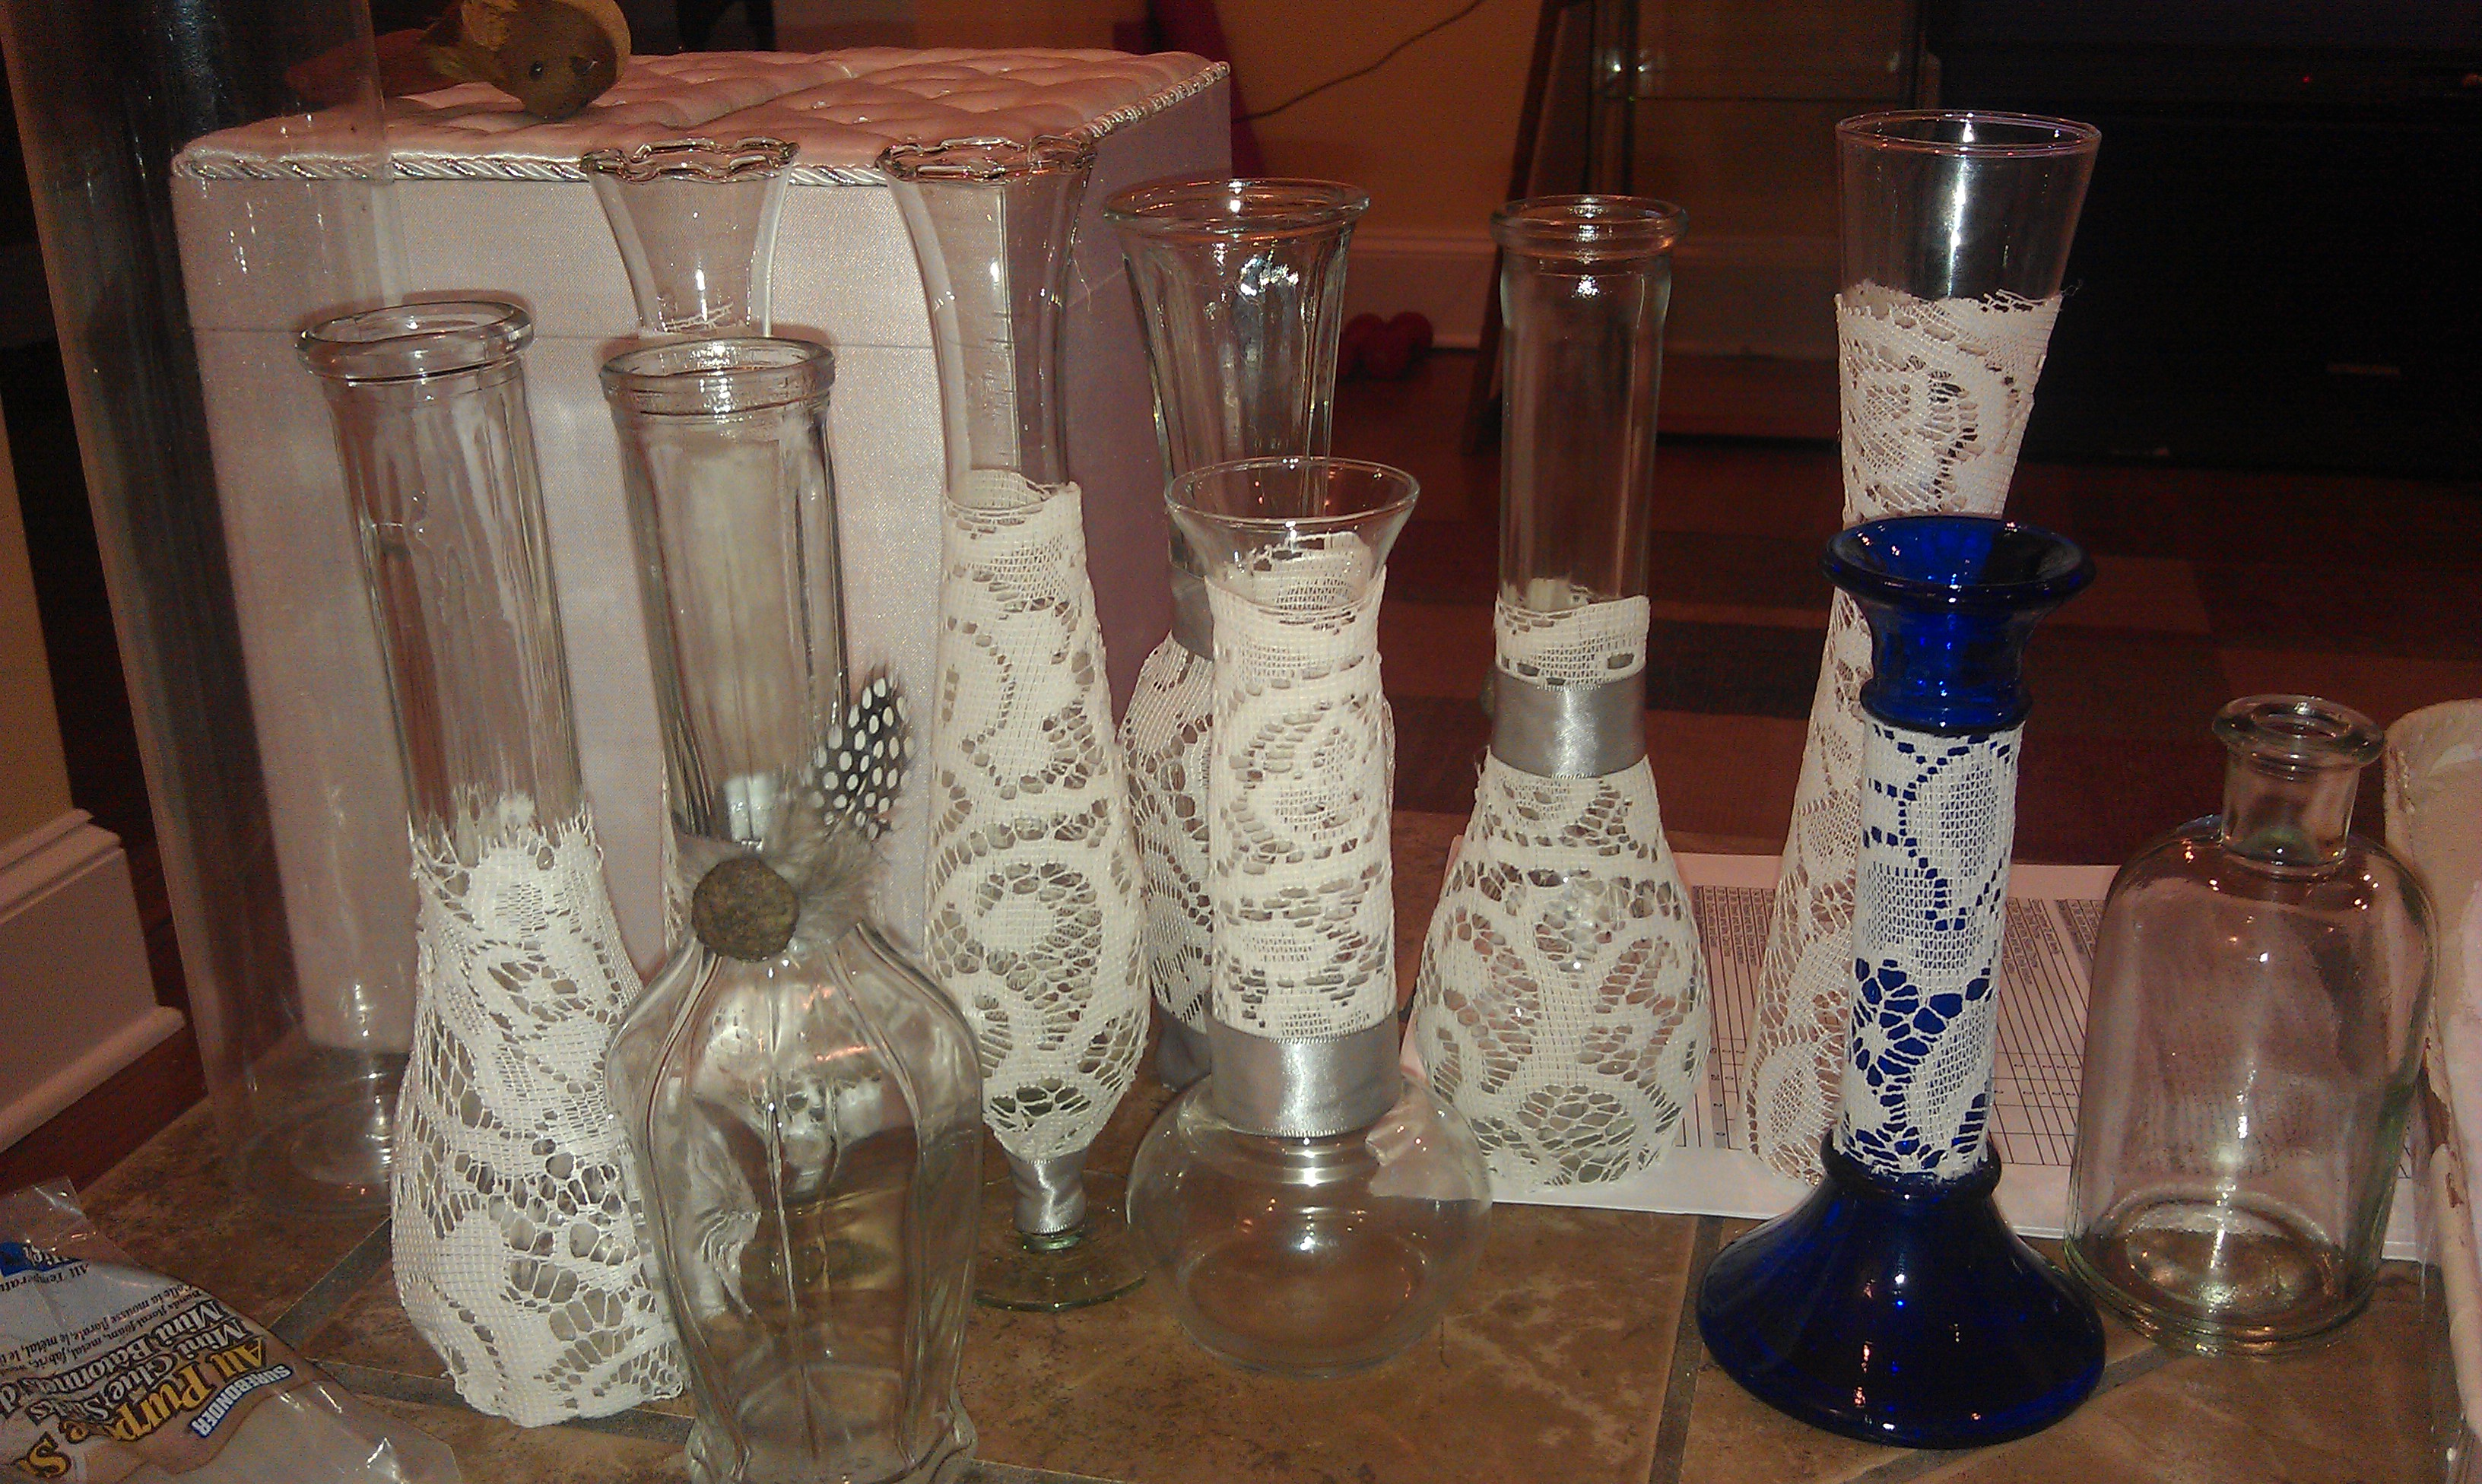 Vintage lace and burlap vase centerpieces from politics